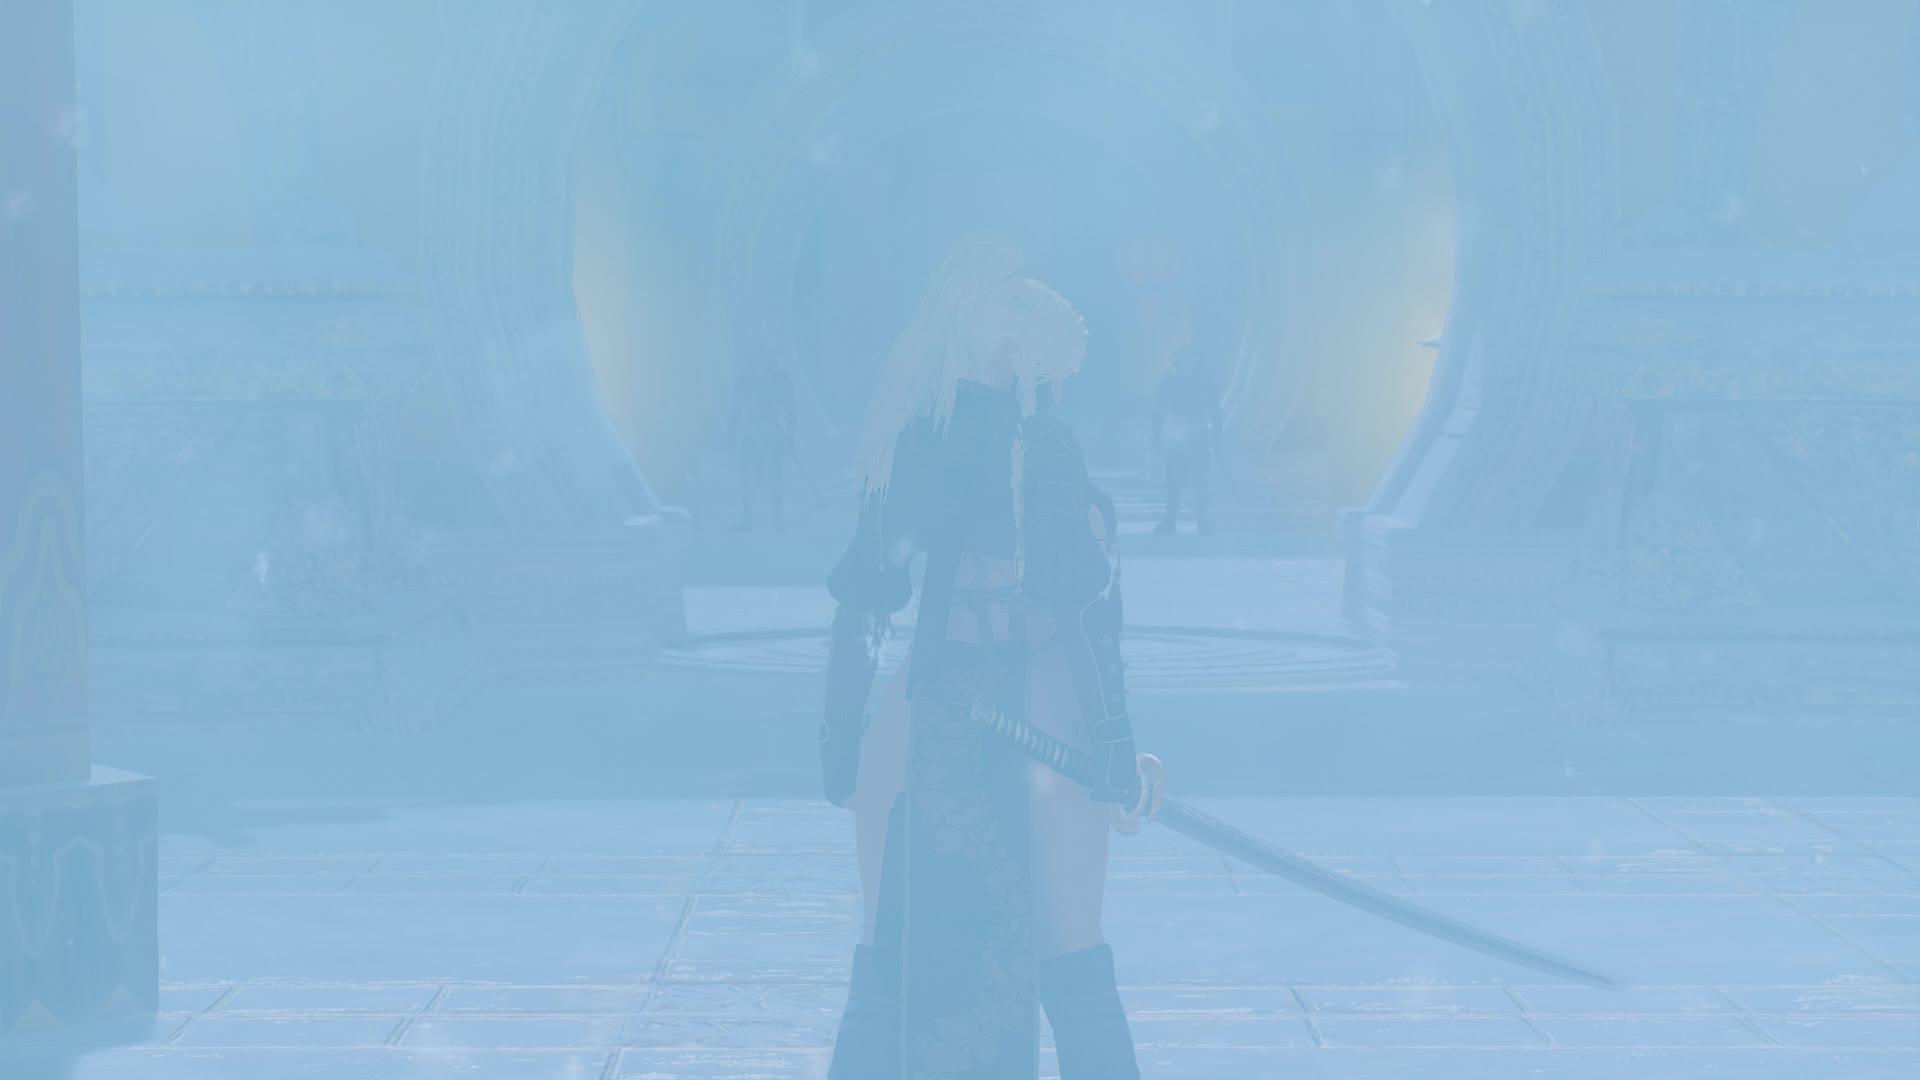 elderscrolls, skyrim, Elder Scrolls V Skyrim 2019.06.08 - 10.12.15.01 GIFs